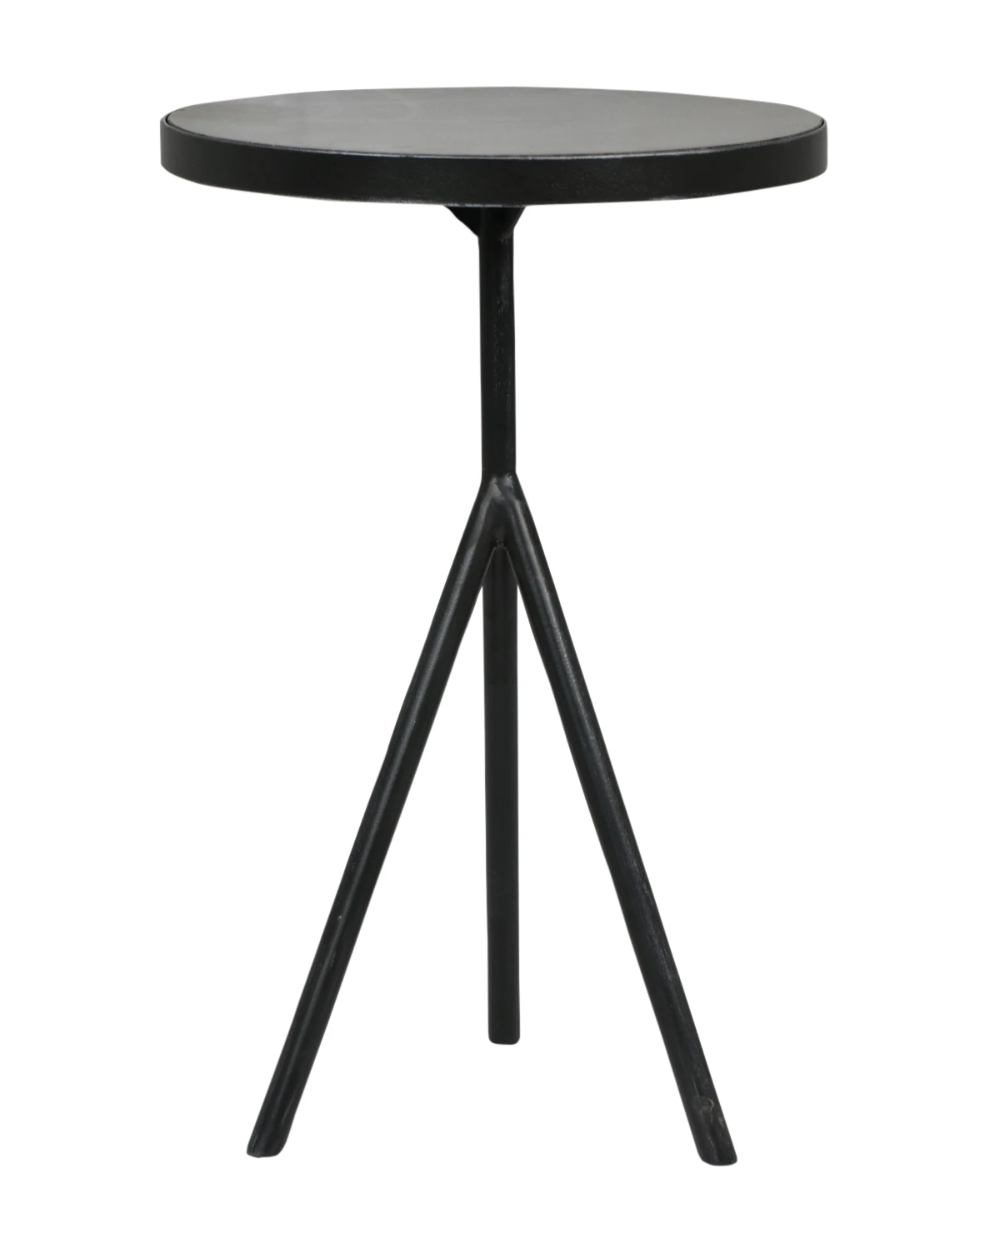 Caleb Side Table Powder Black Bluestone In 2020 Side Table